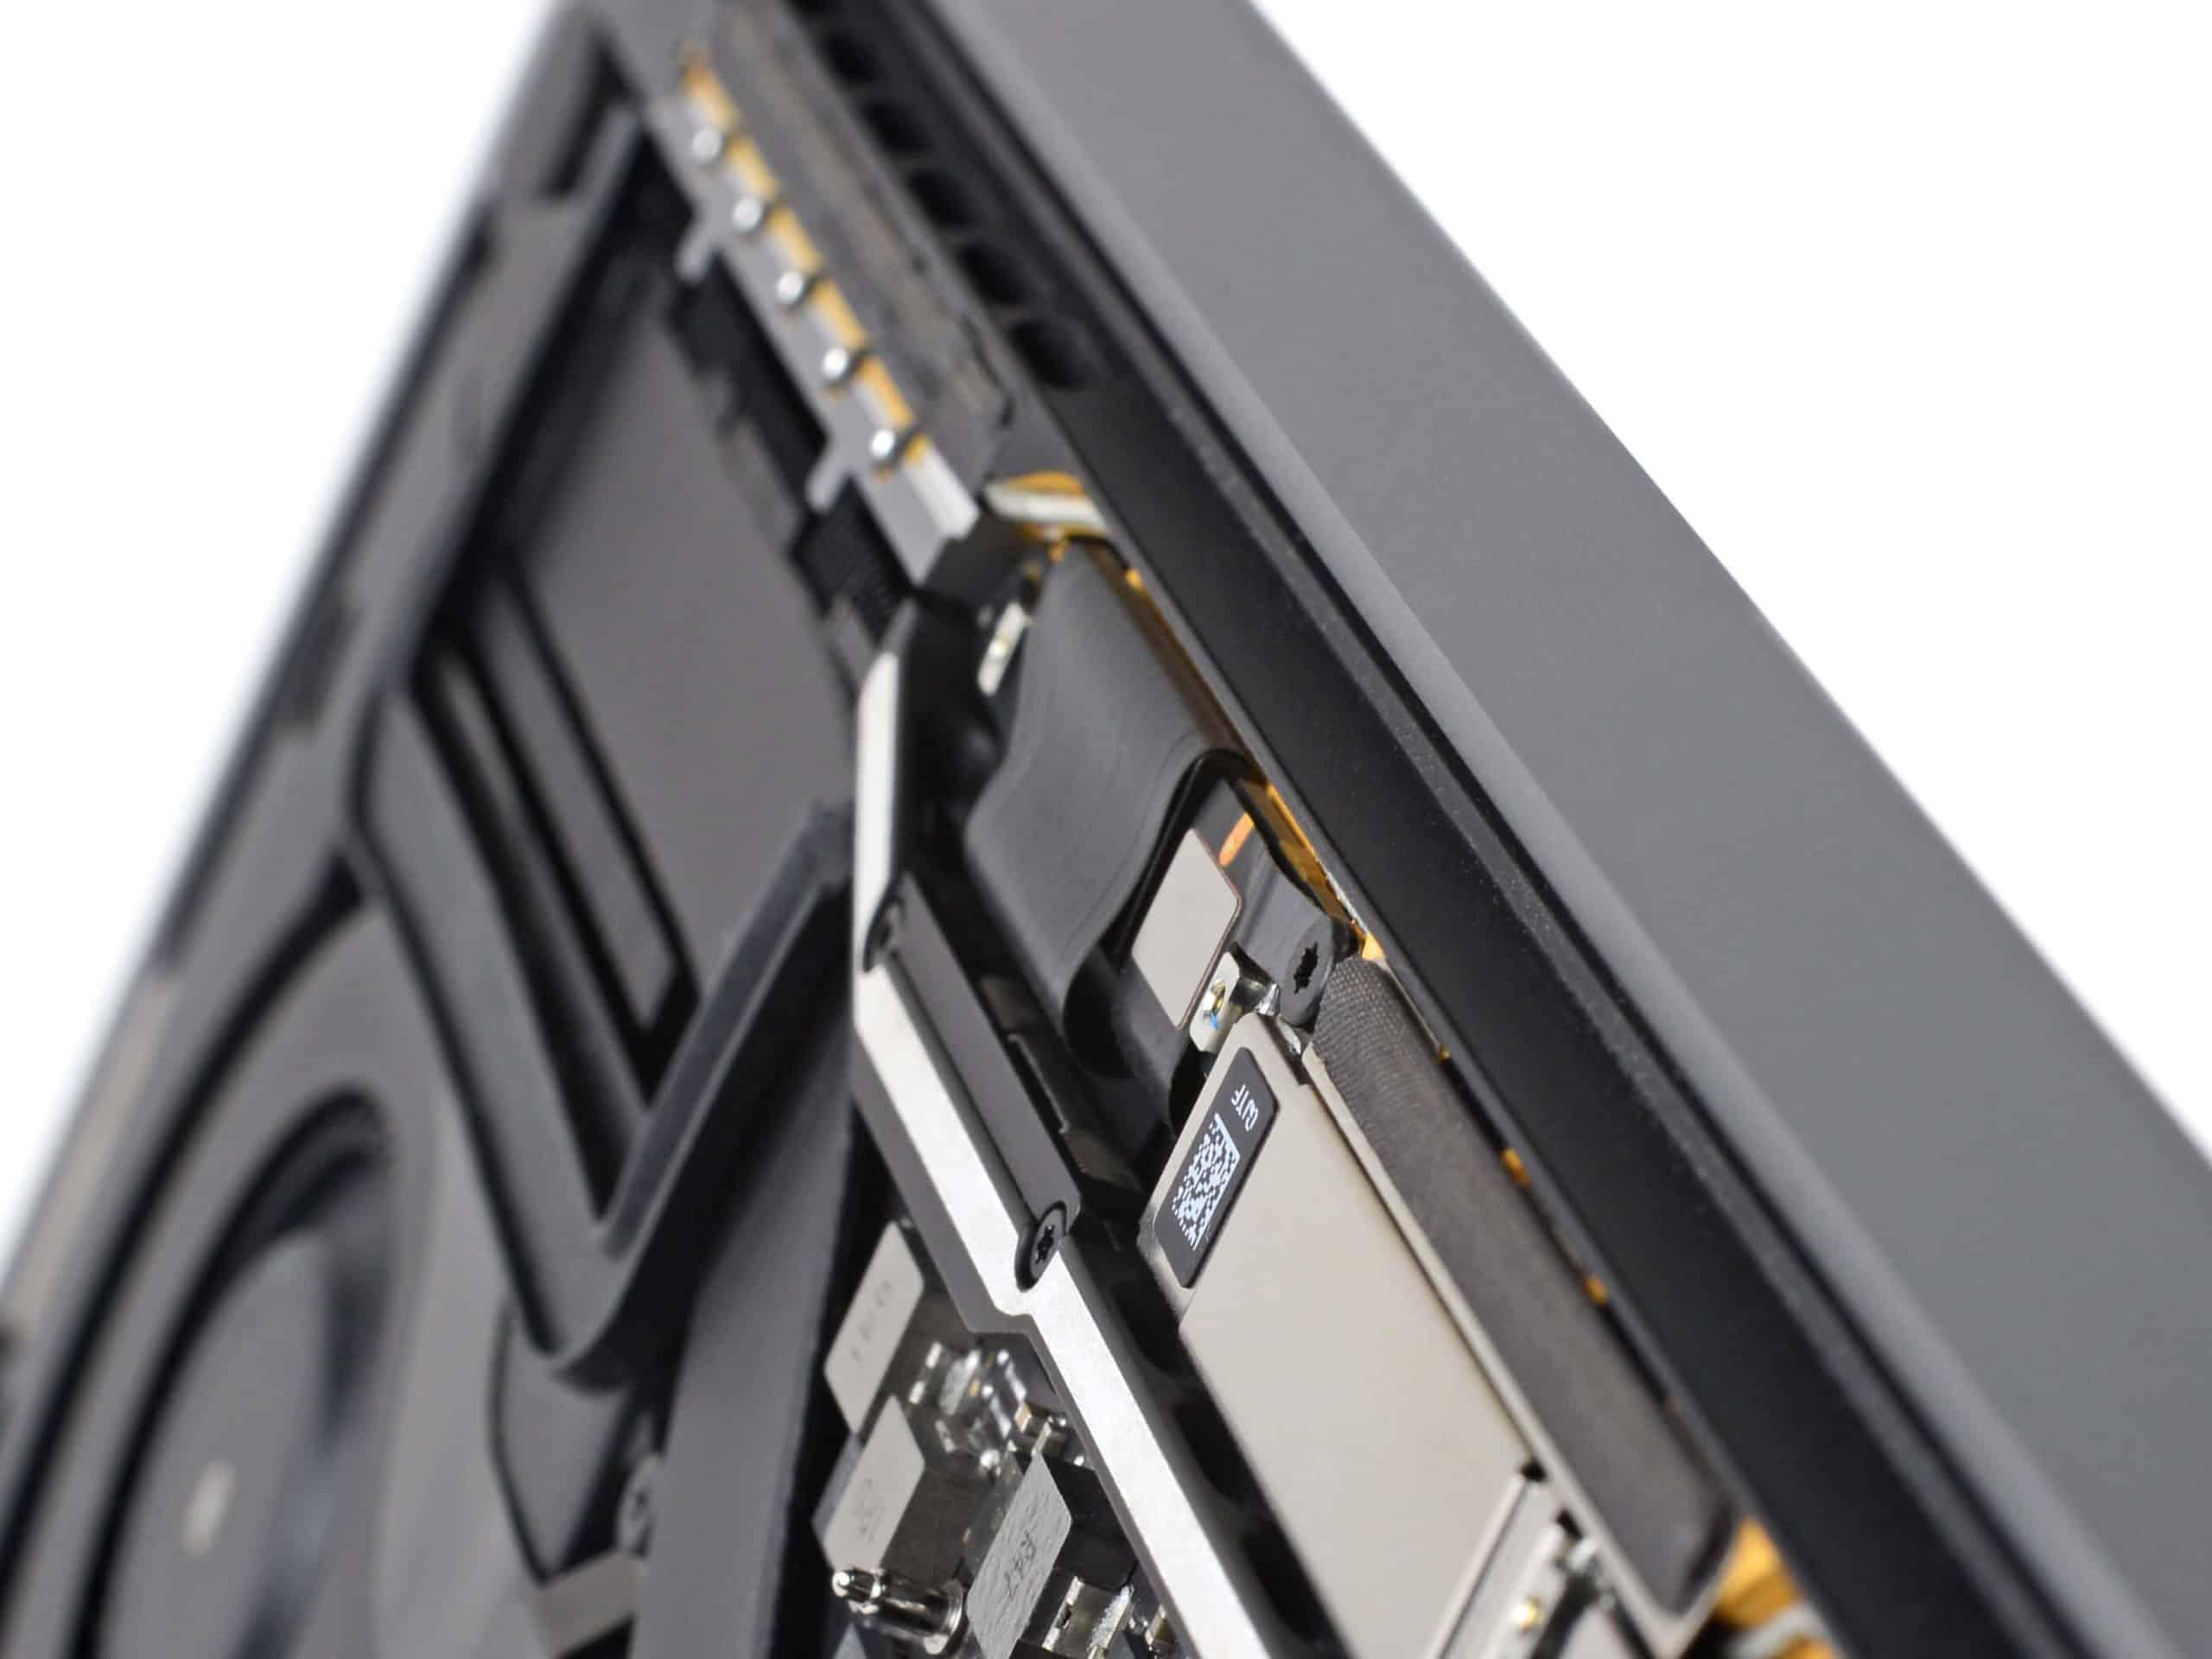 MacBook Pro 2016 Innenleben - iFixit